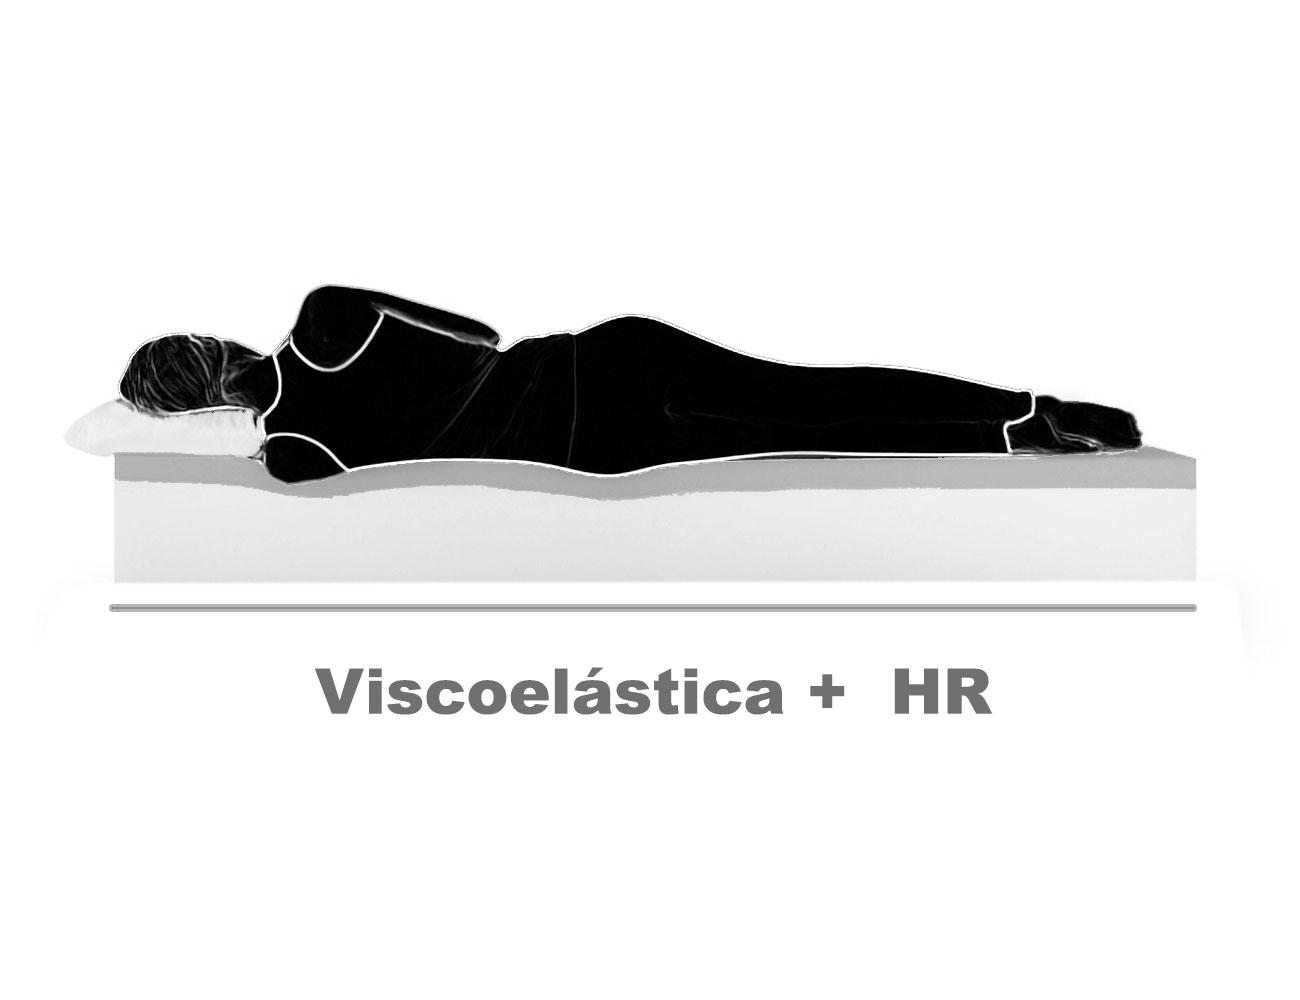 Viscoelstica hr1